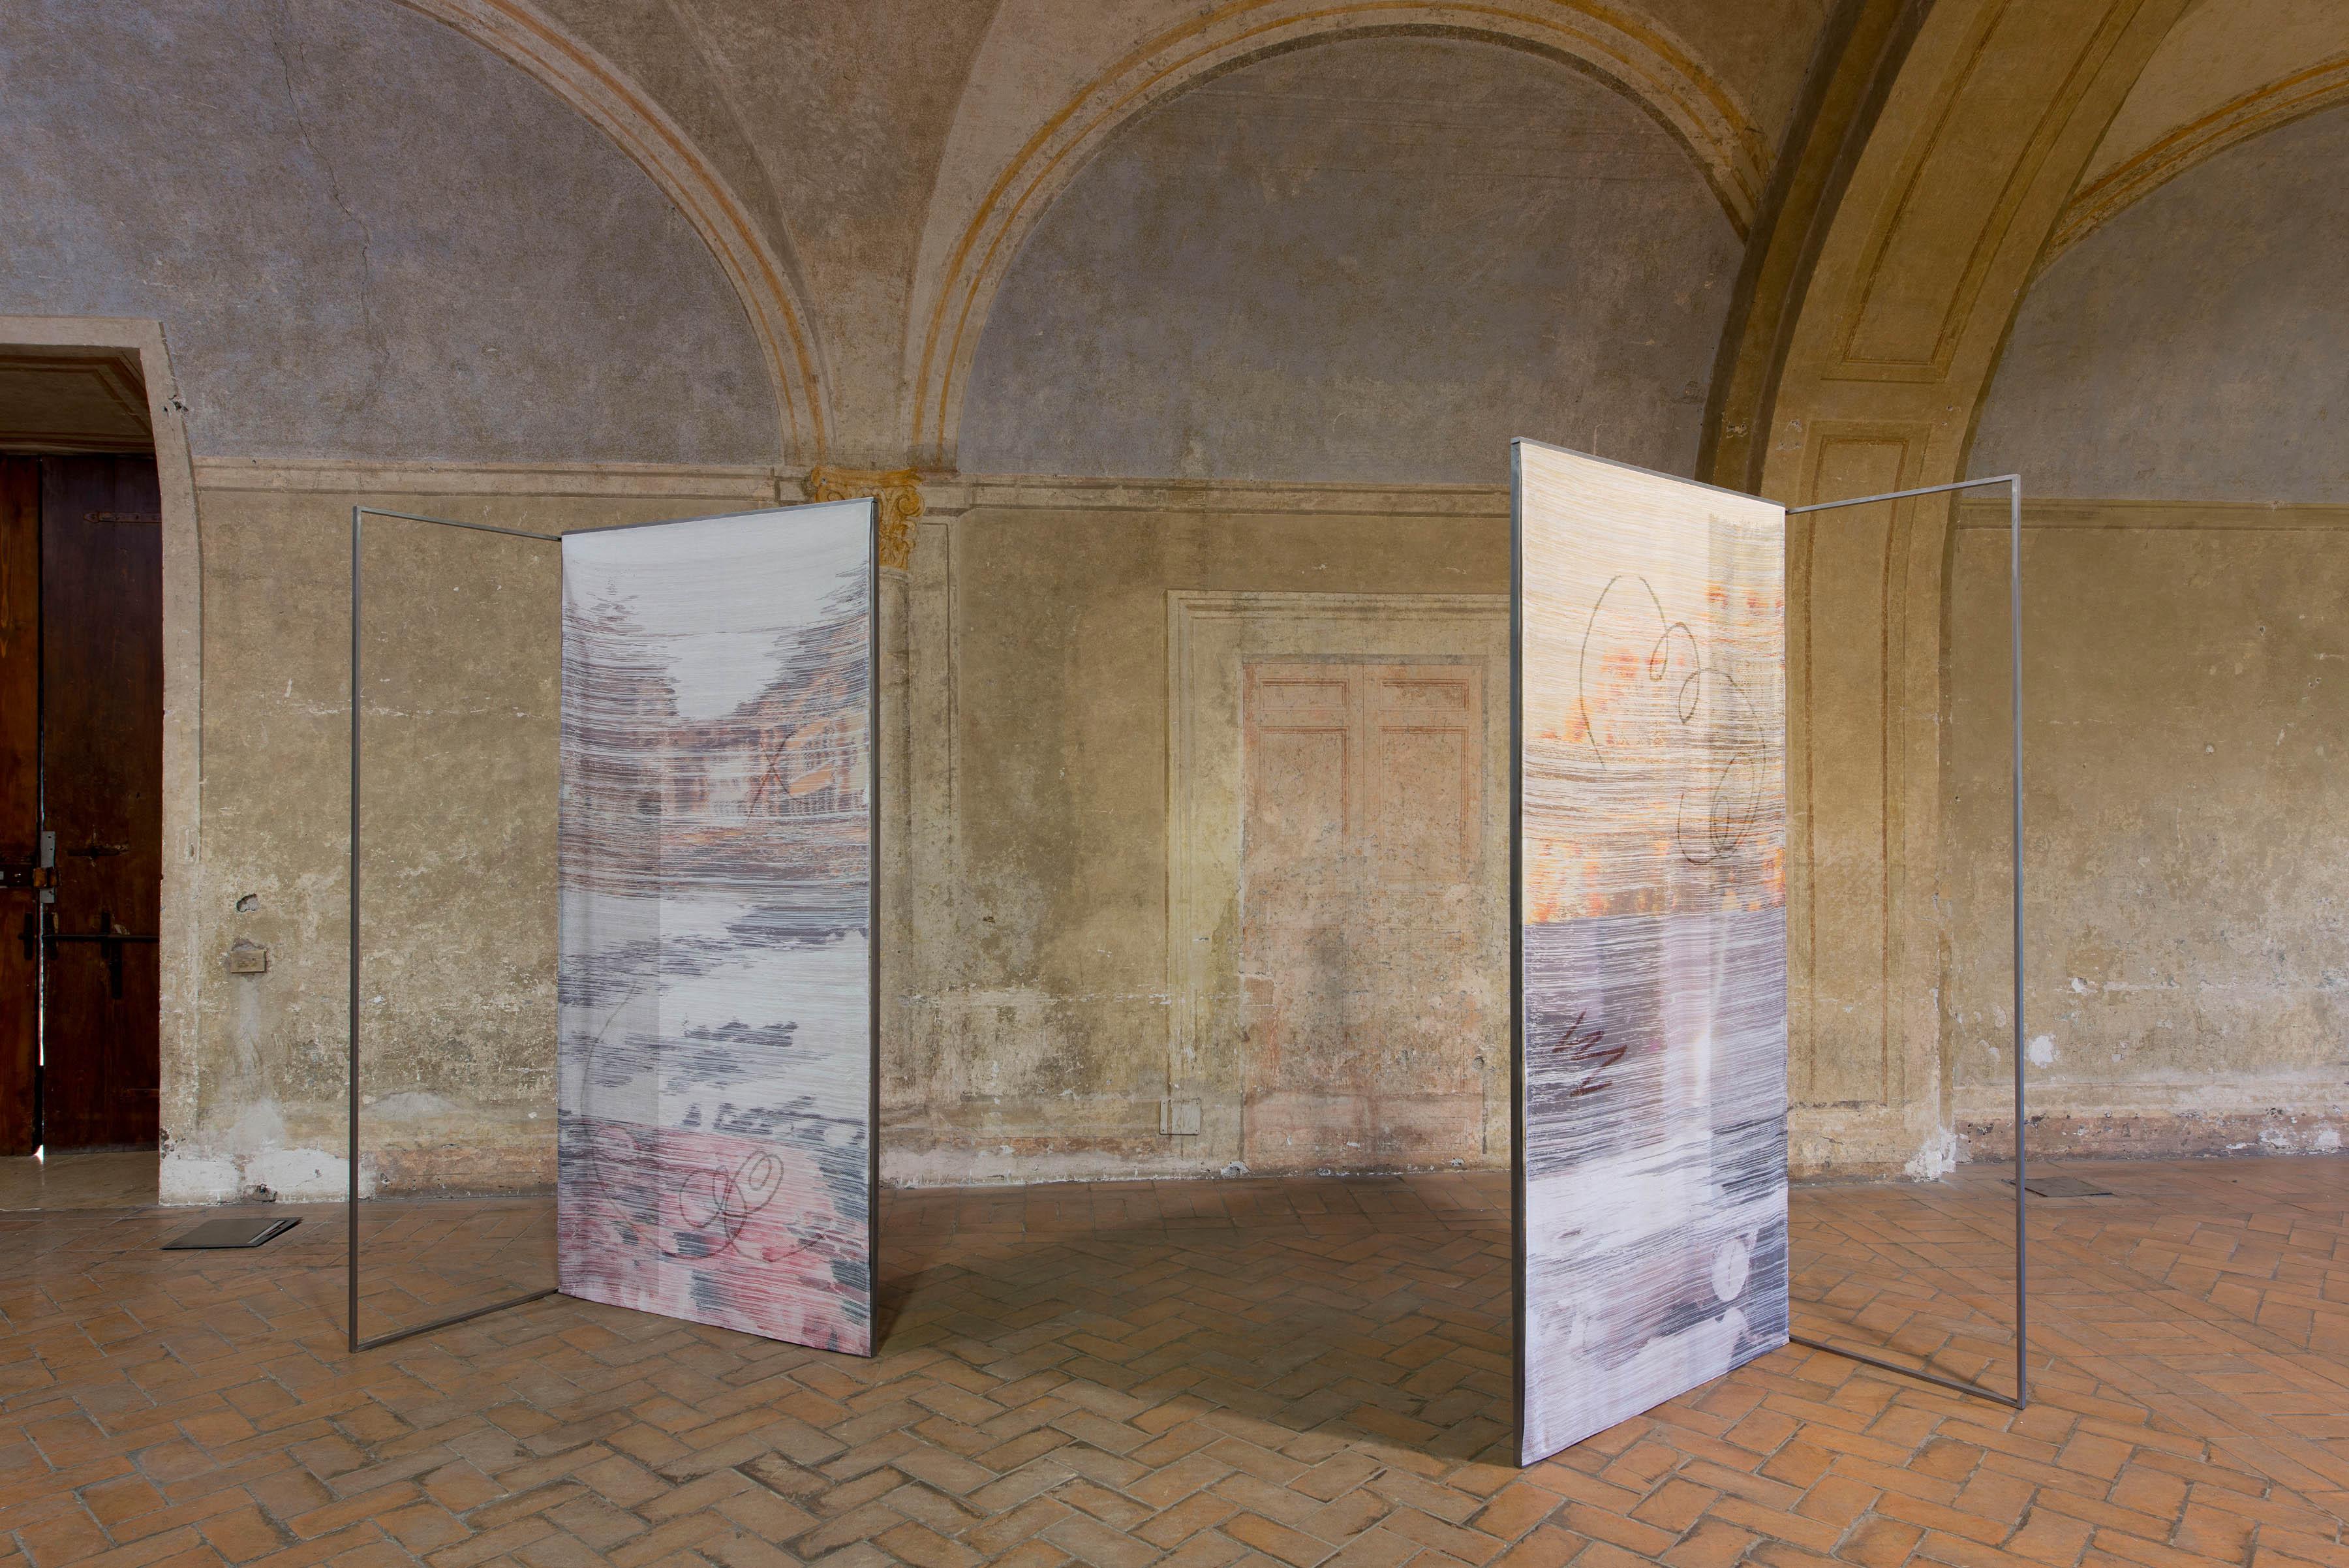 Margo Wolowiec Installation view, Granpalazzo 2015 with Anat Ebgi, 2015